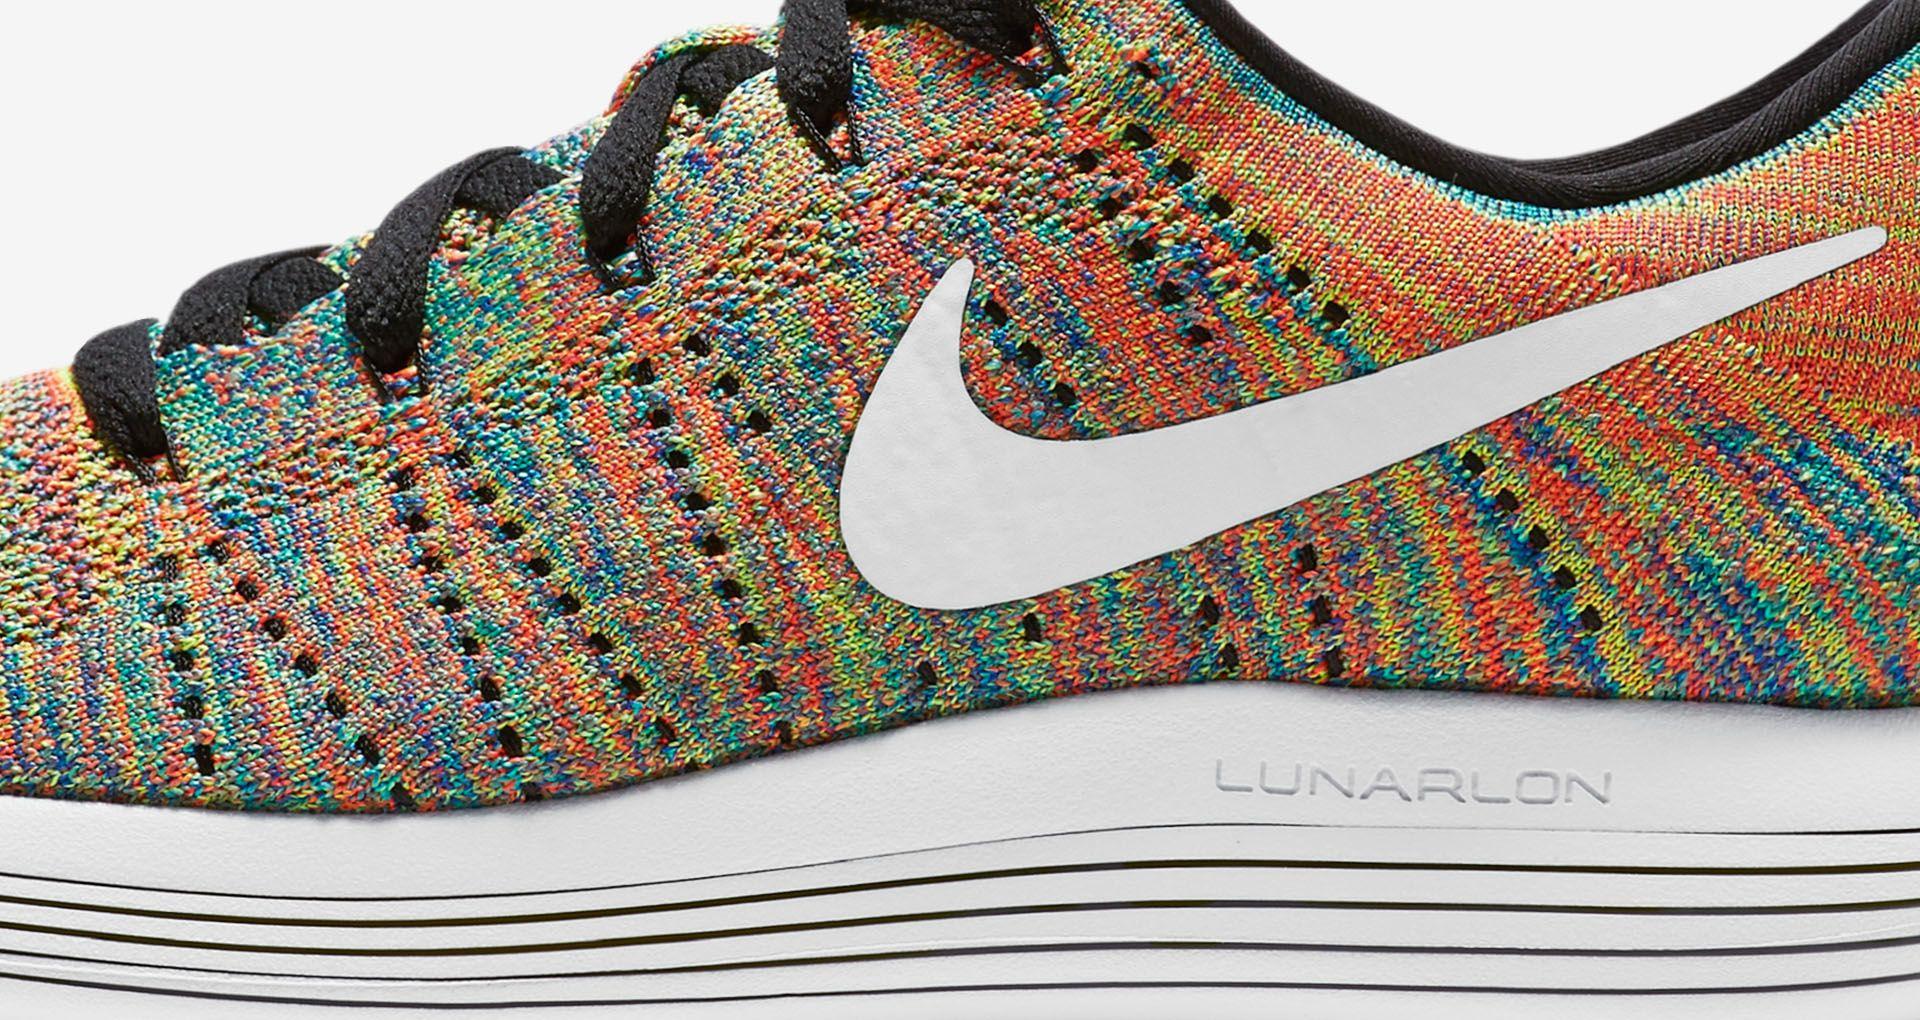 515a39ea6c3 Nike LunarEpic Low Flyknit  Multi-Color  Release Date. Nike+ SNKRS